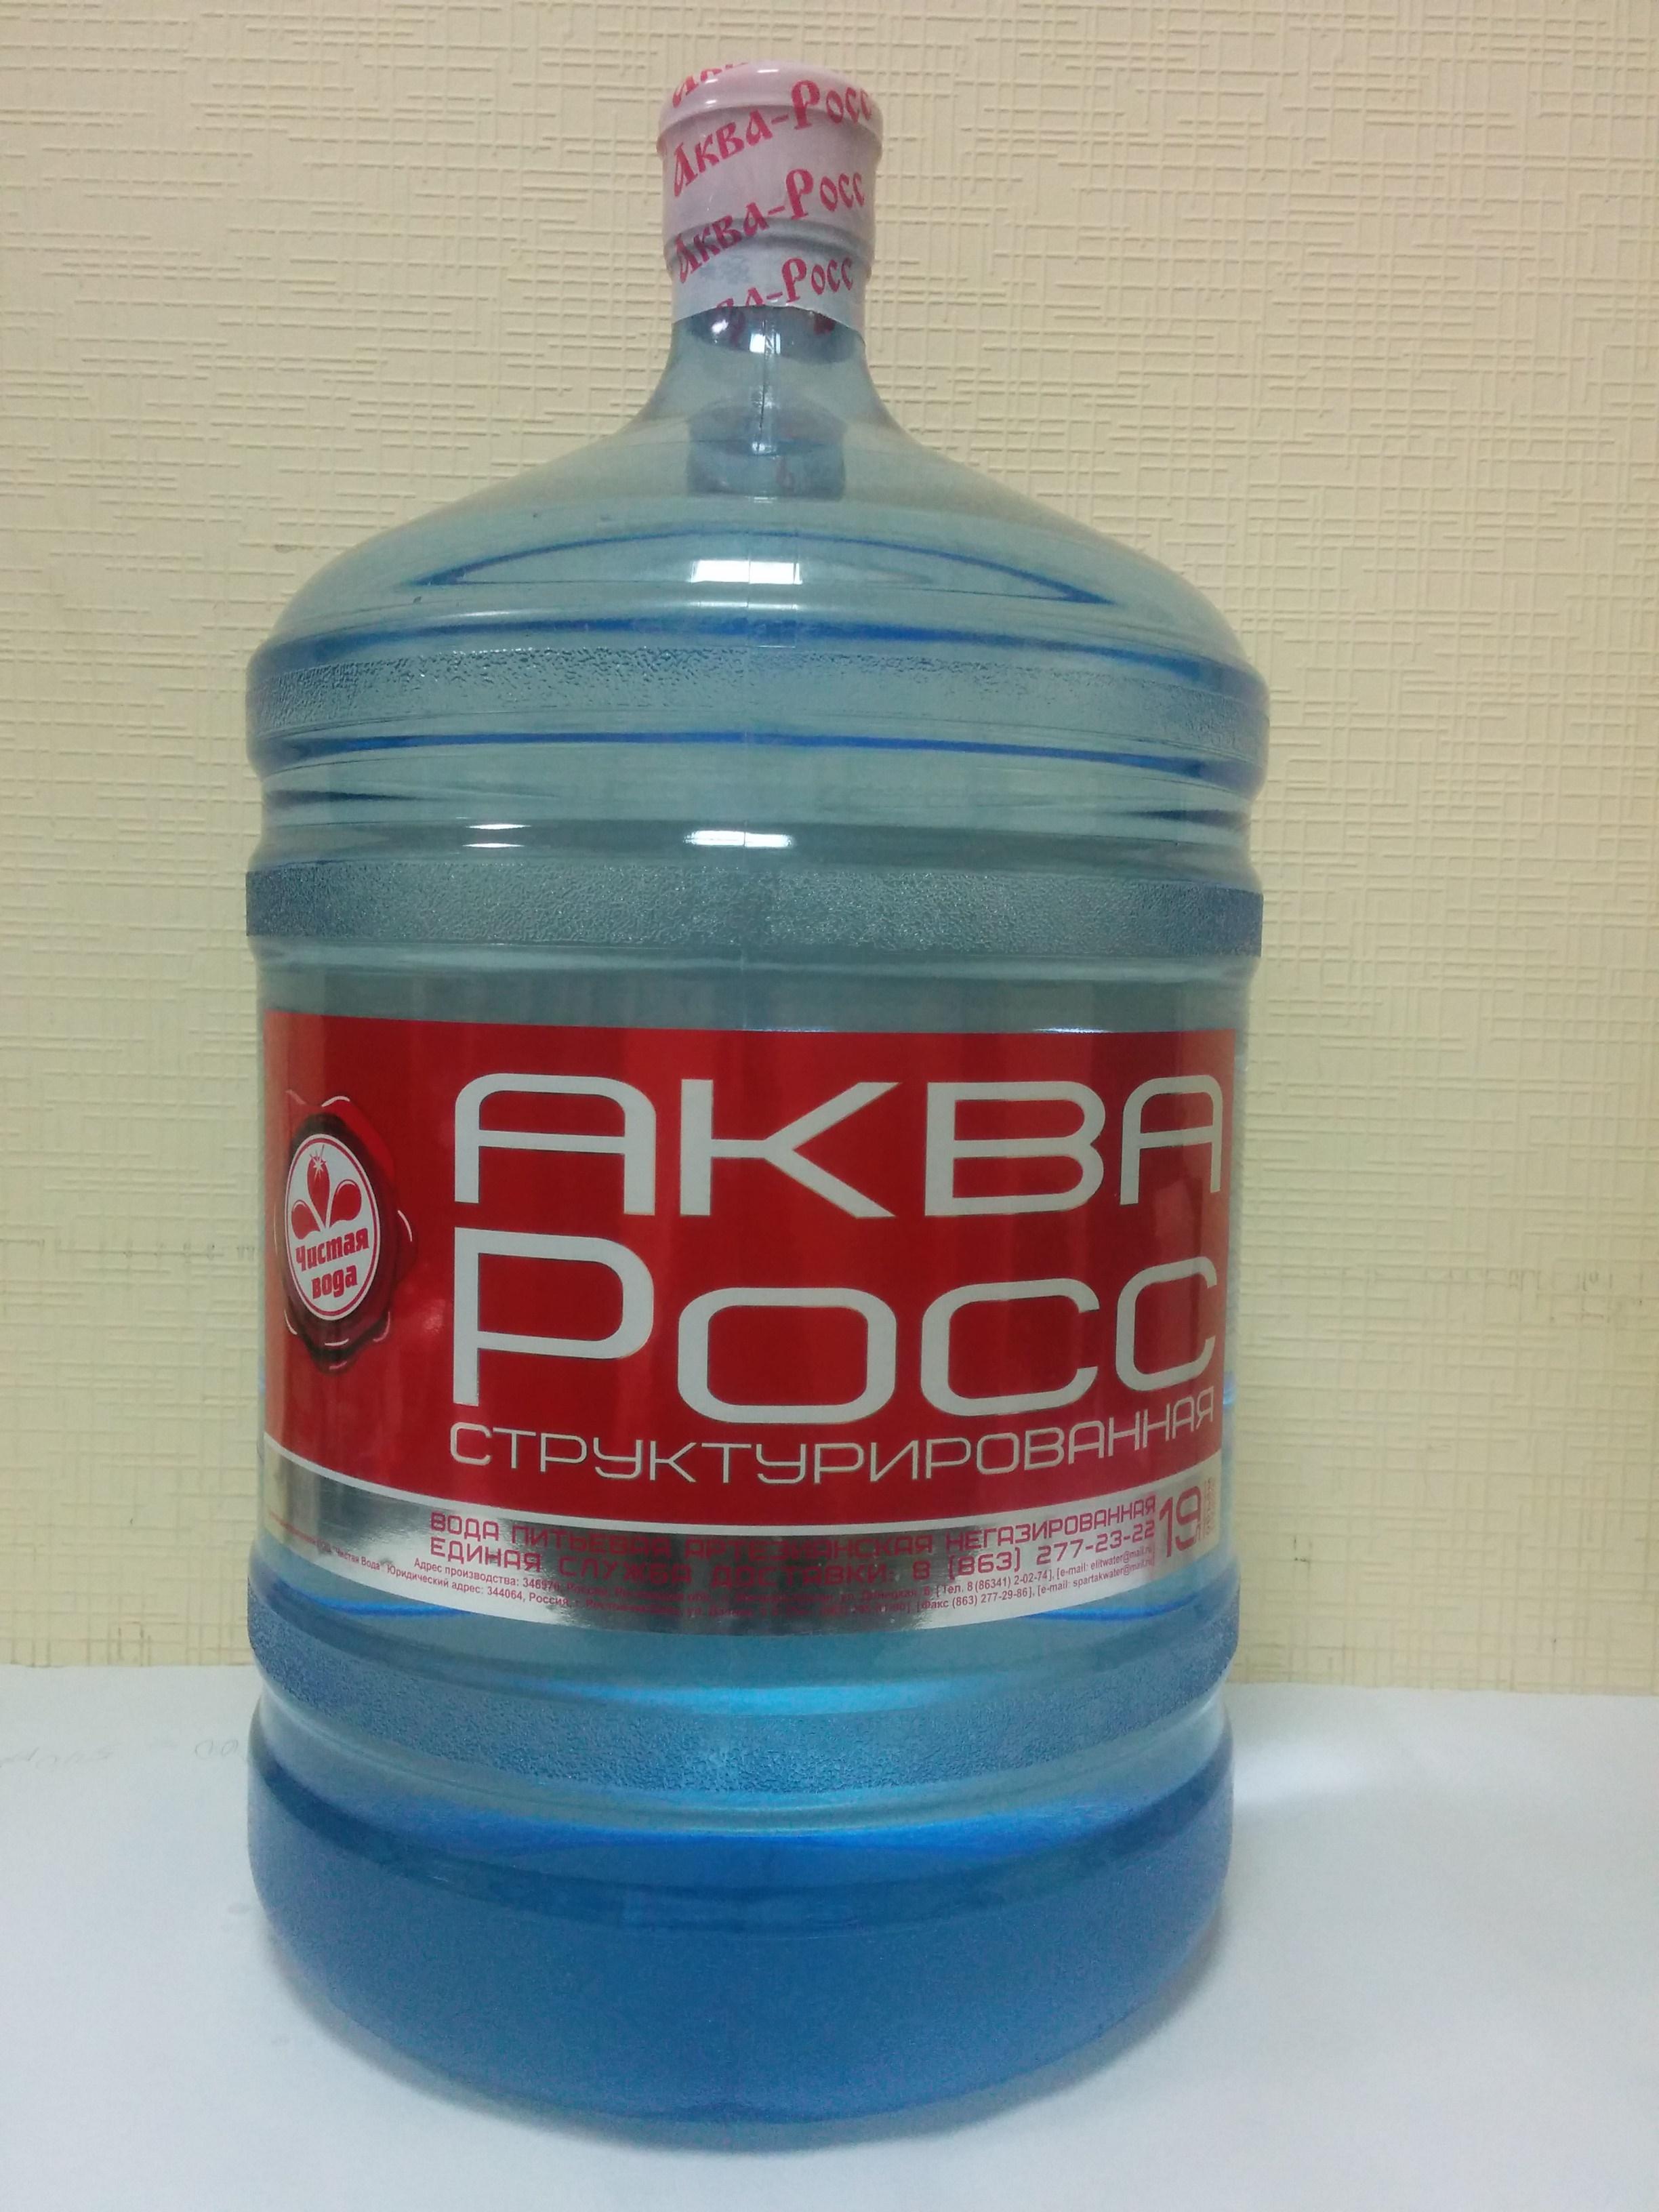 вода от холестерина